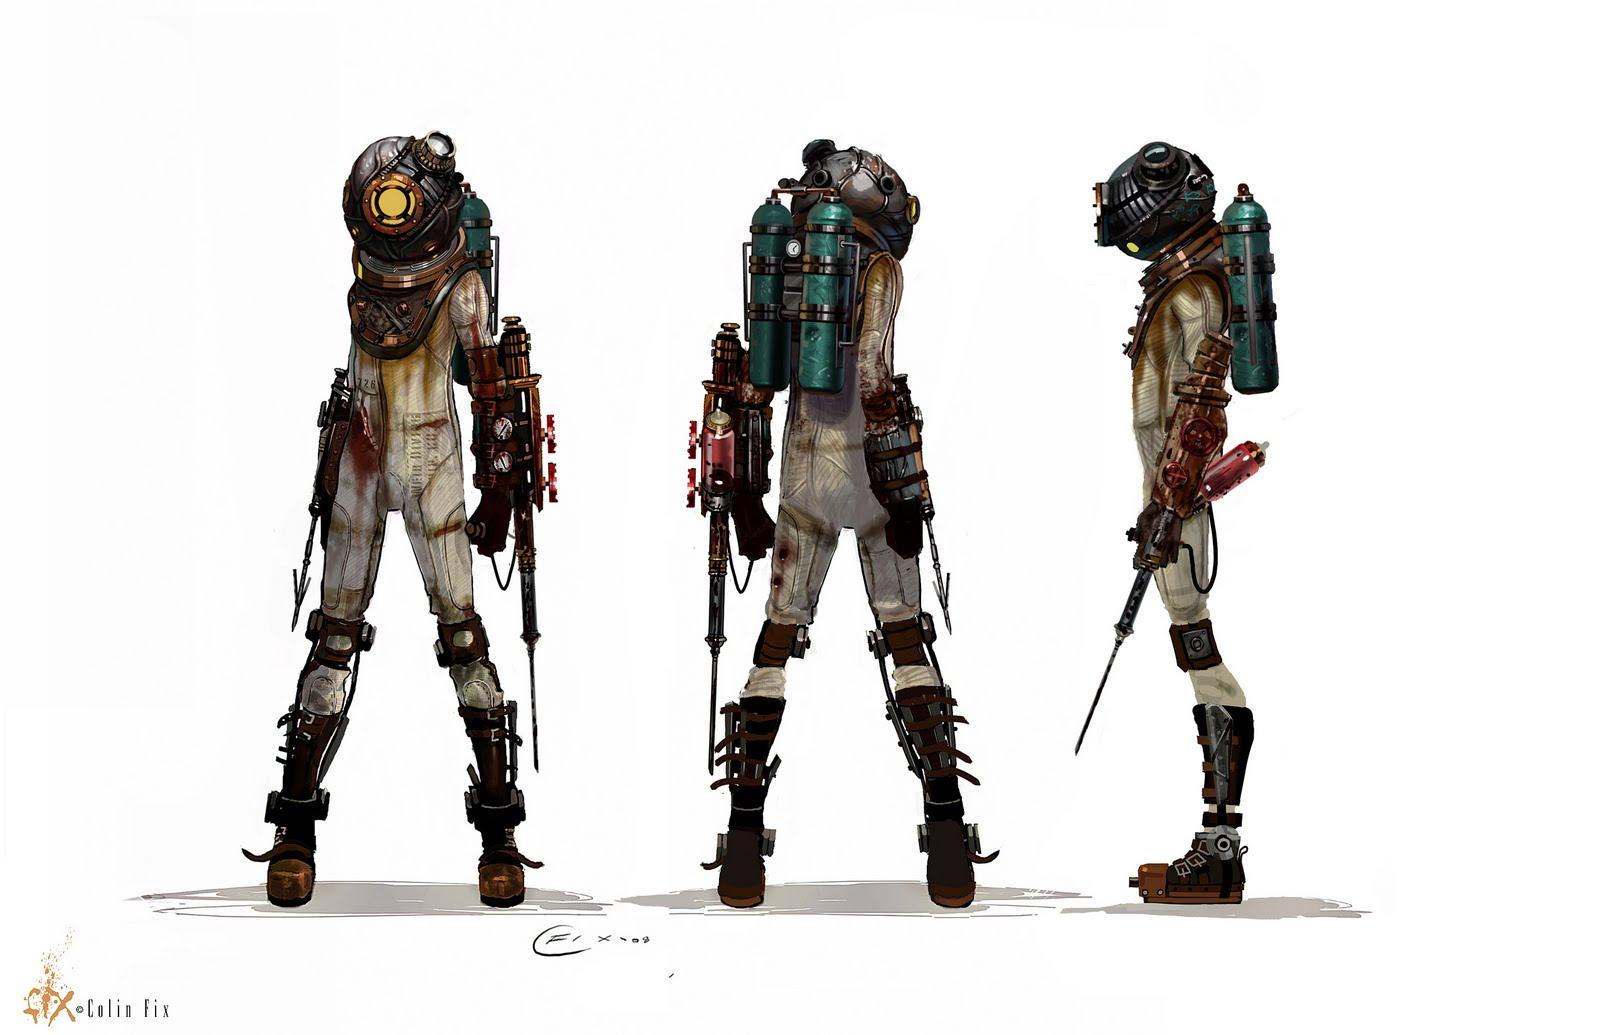 Image bioshock wiki fandom - Bioshock wikia ...